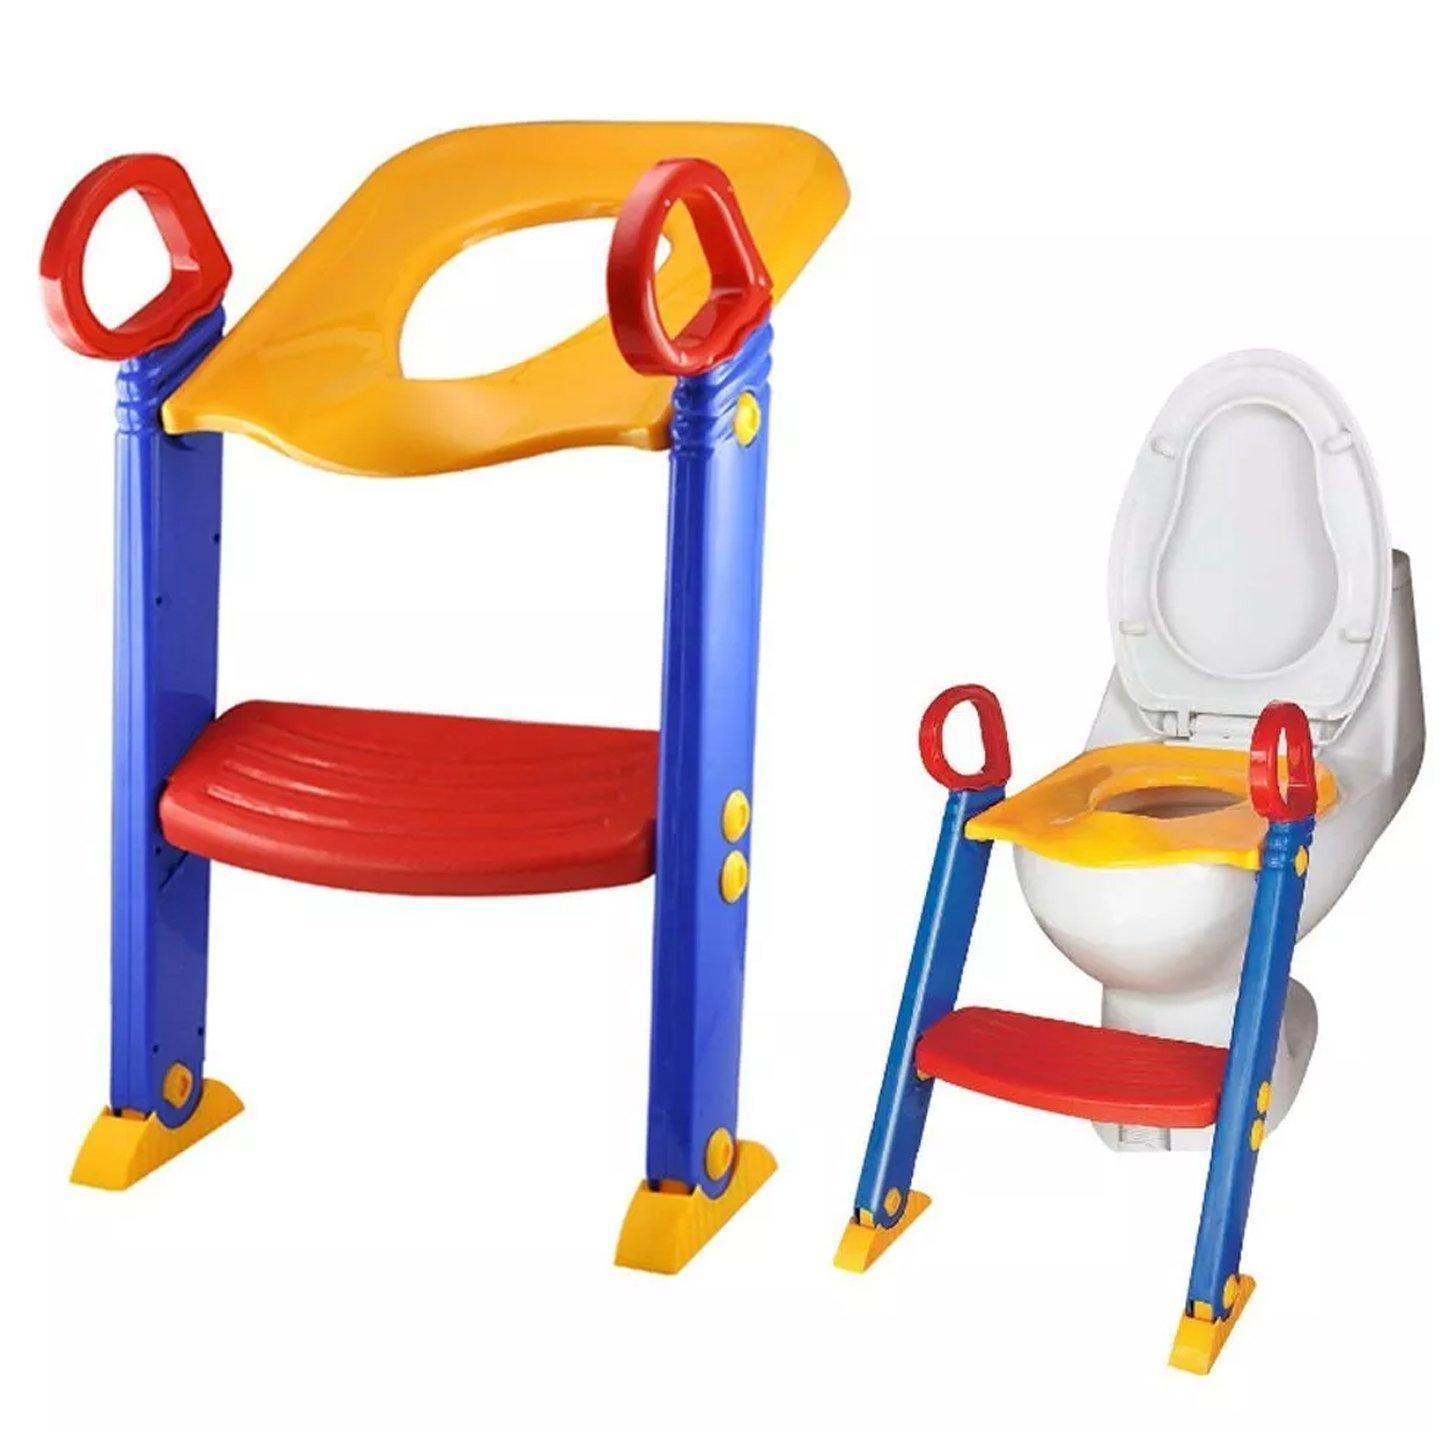 Toddler Potty Training Seat Baby Child Kids Plastic Toilet Trainer Boys Girls UK